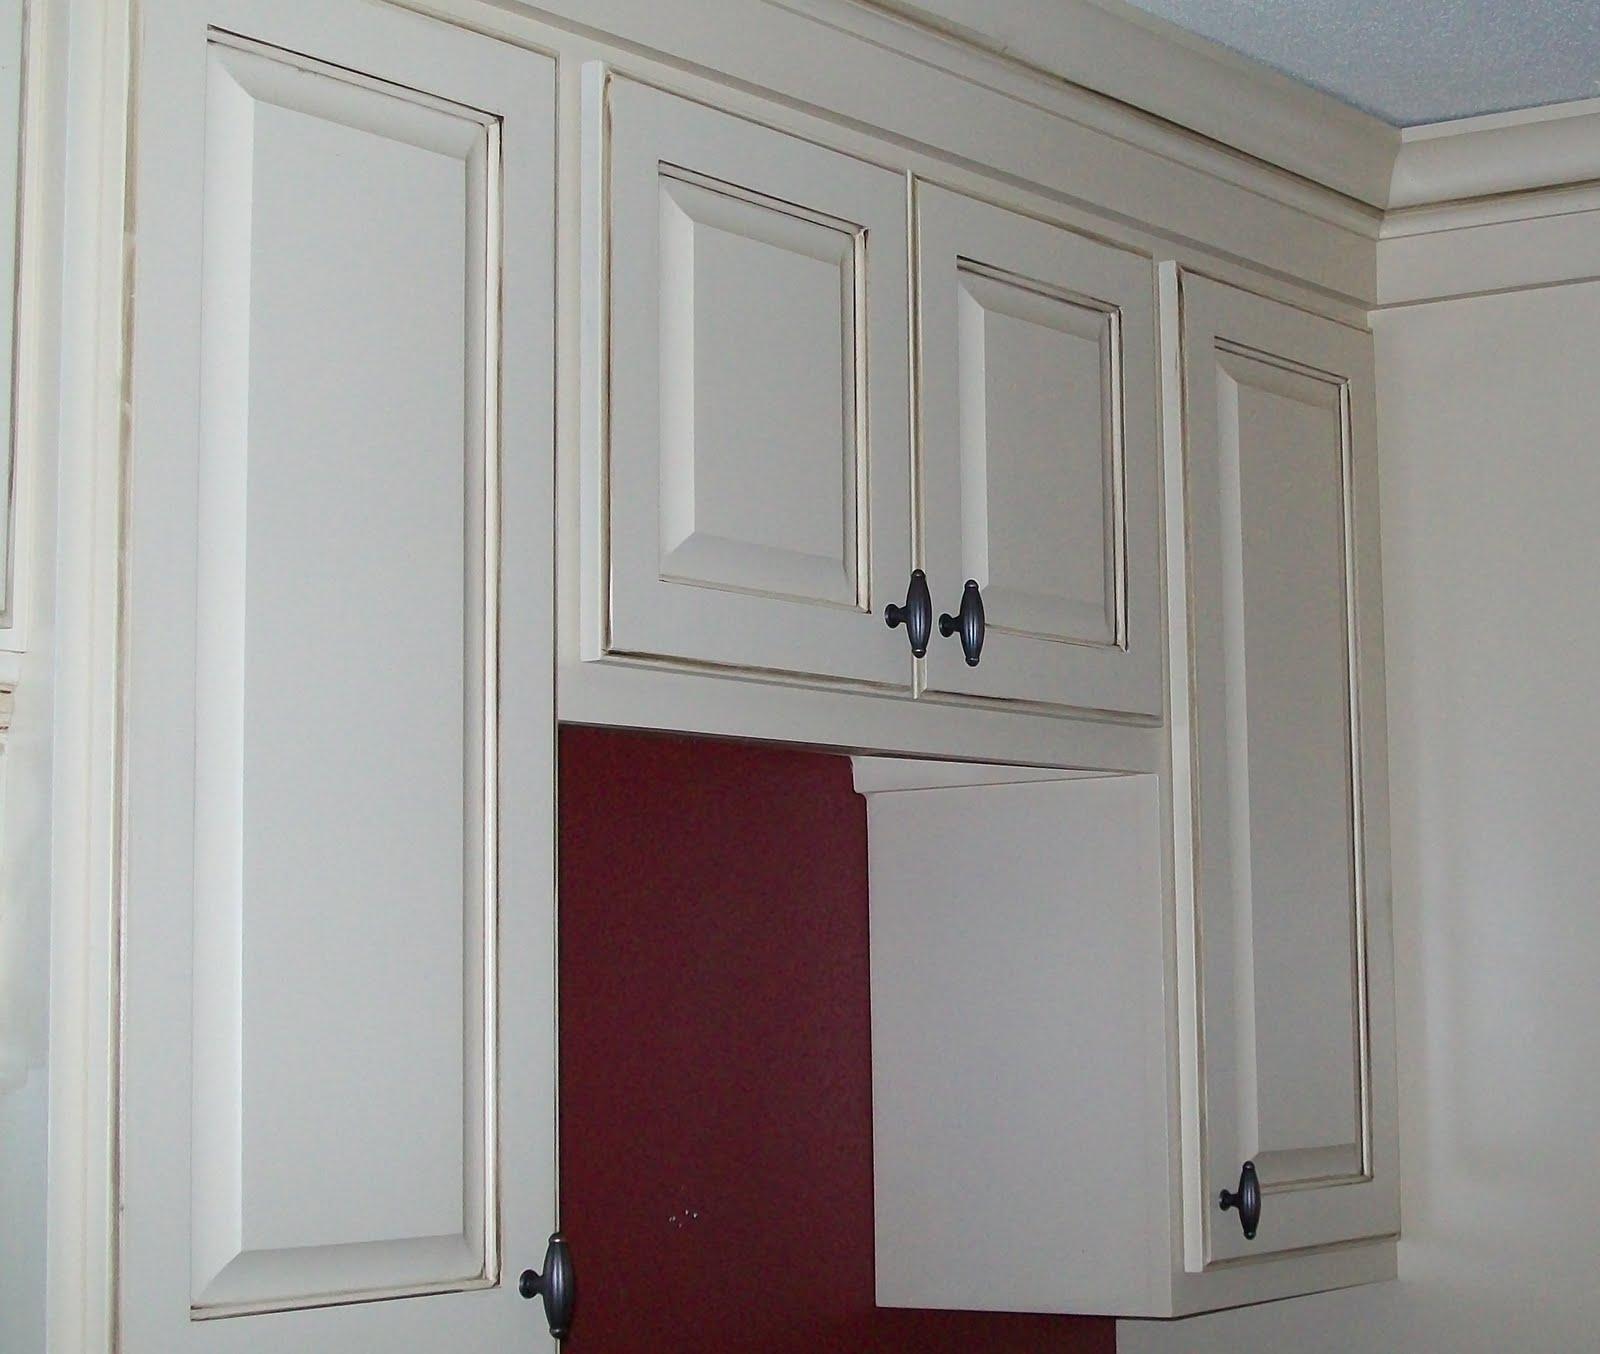 Glazed Kitchen Cabinets Backsplash Ideas For Lwi Custom The Newest Way